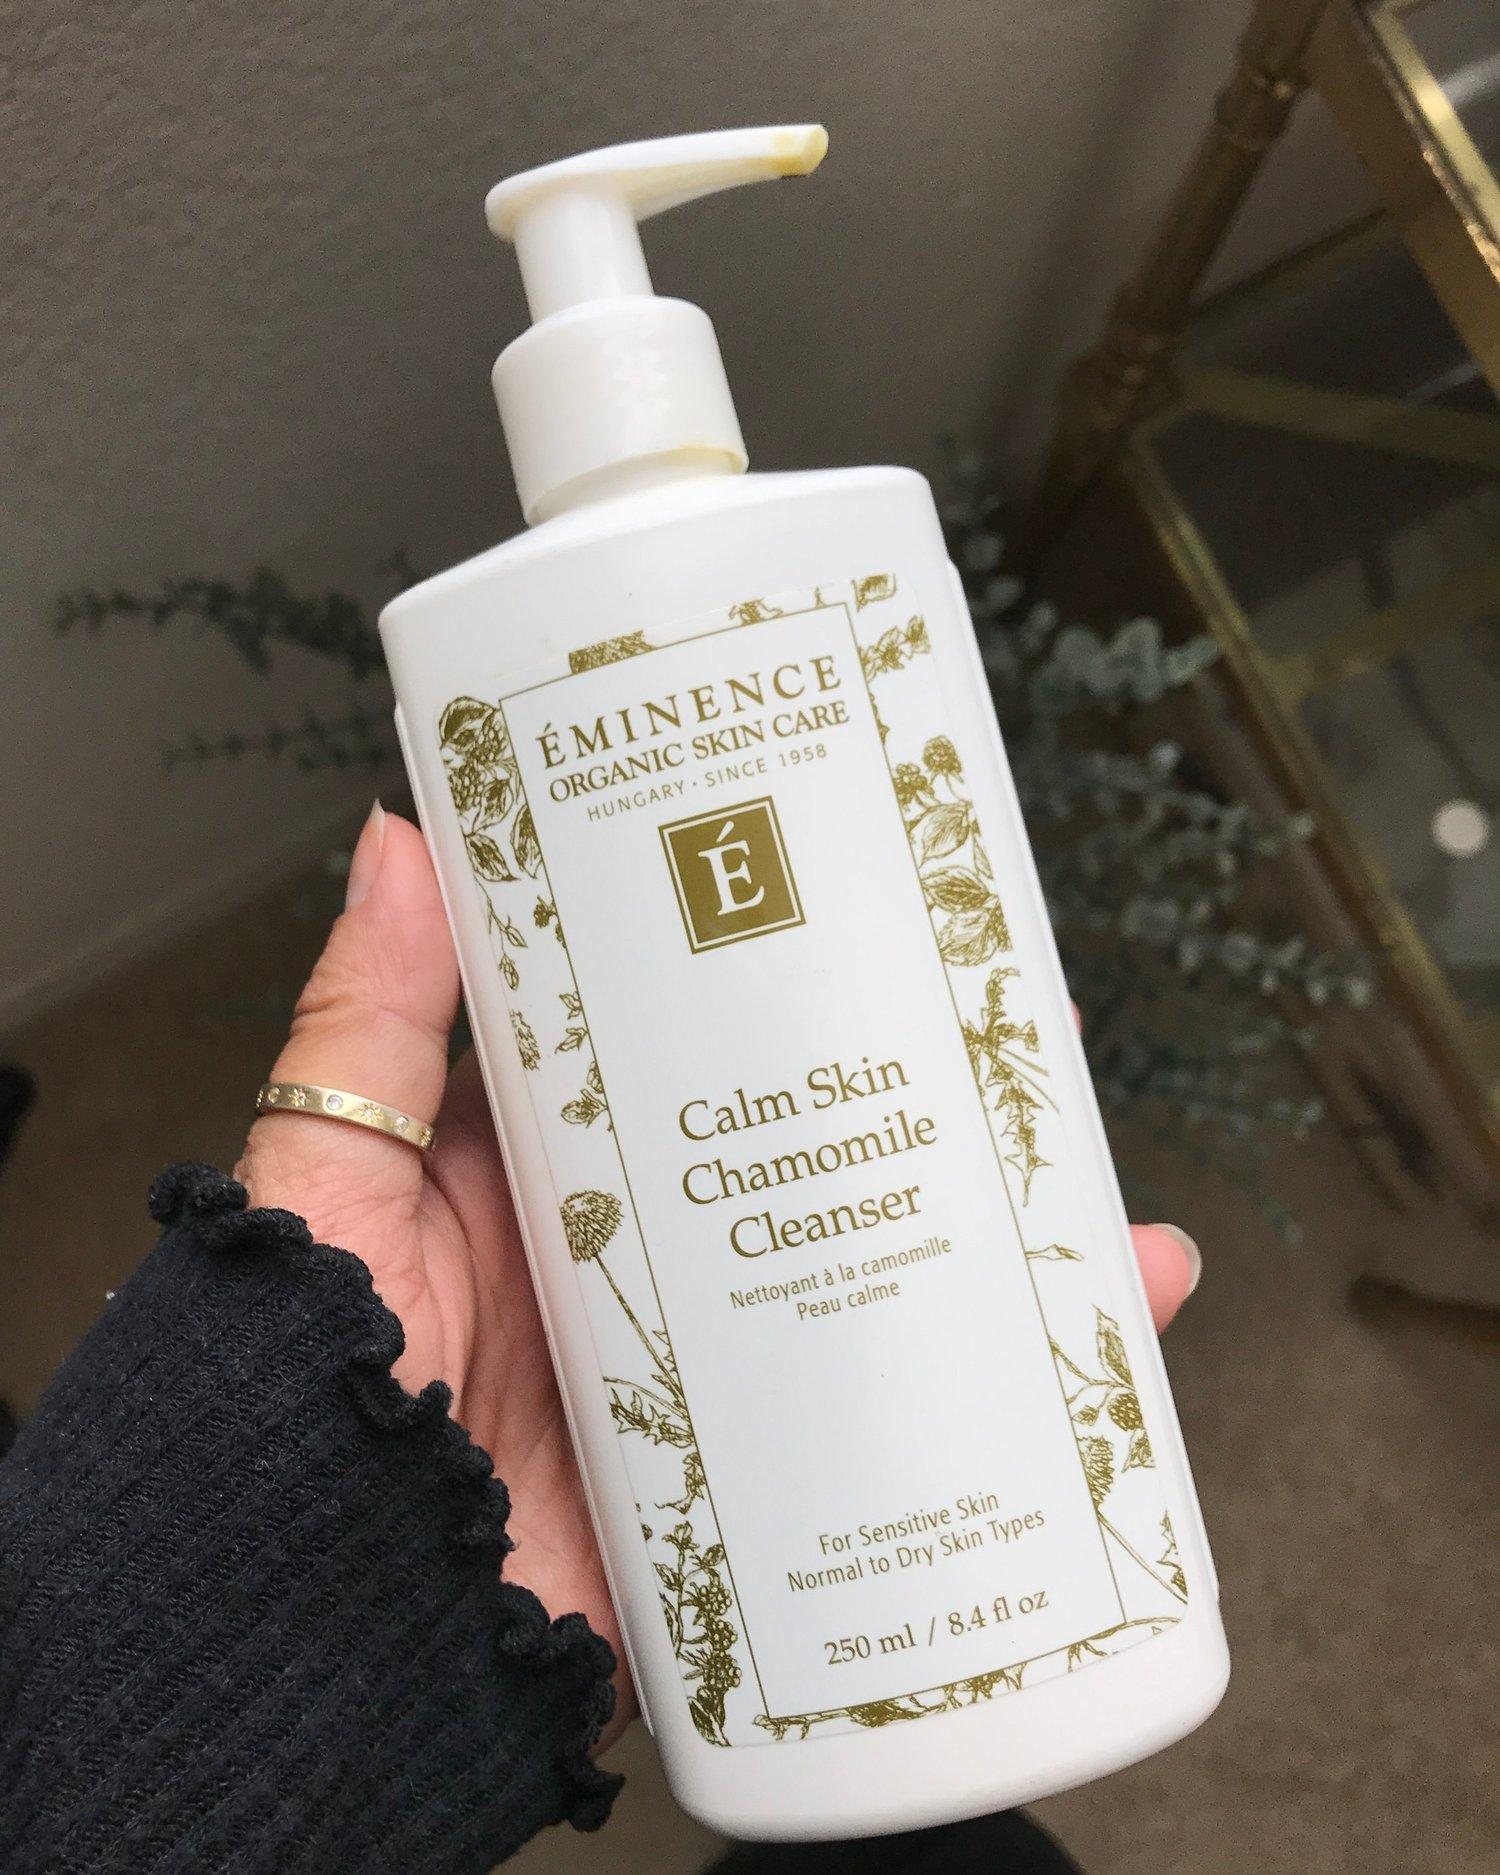 eminence+calm+skin+cleanser